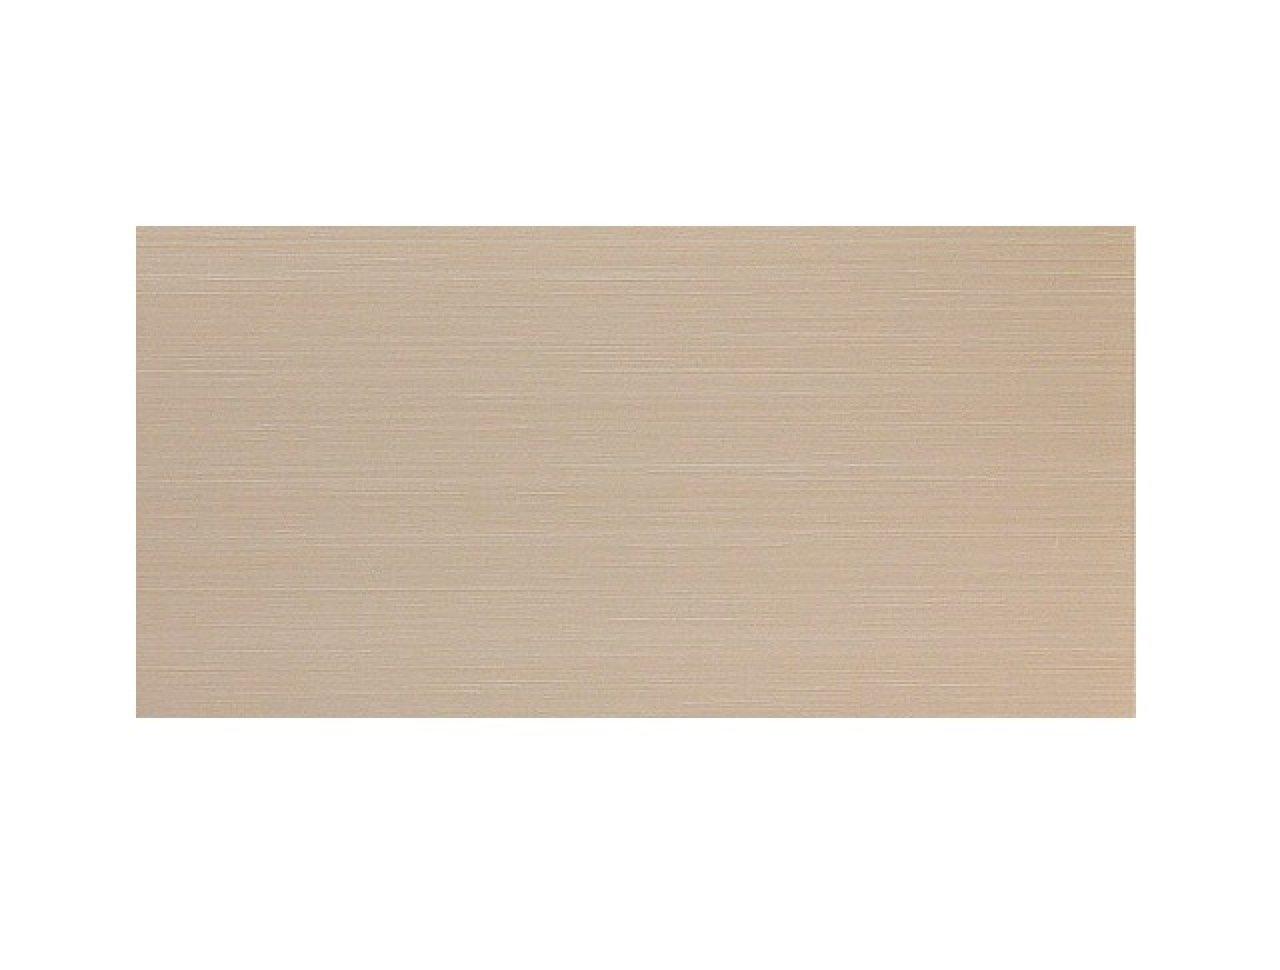 Настенная плитка Brilliant Sable 40x80